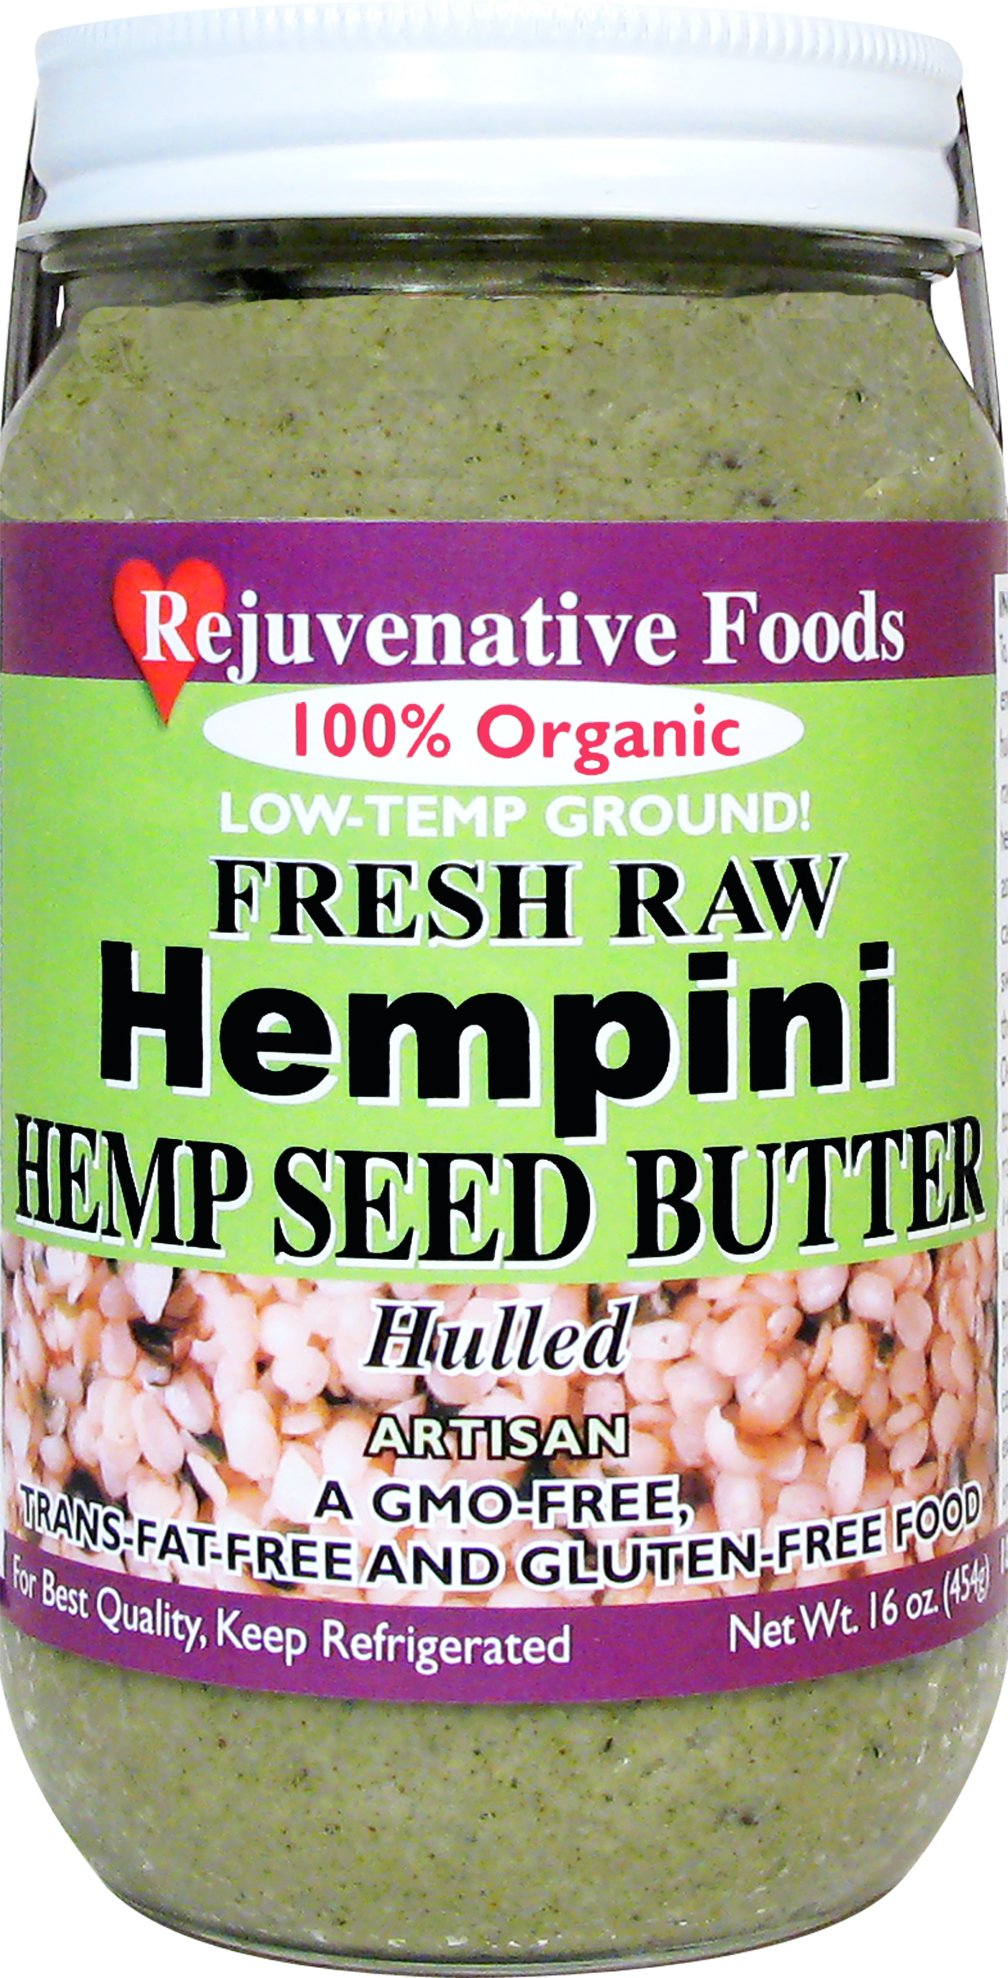 FOUR 8 oz. Fresh Raw Organic Hempini Hemp Seed Butter Pure Rejuvenative Foods Low-Temp-Ground Artisan-Vegan In-Glass Vitamin-Protein-Antioxidant-Mineral-Nutrition Certified Organic (4 - 8 oz.)